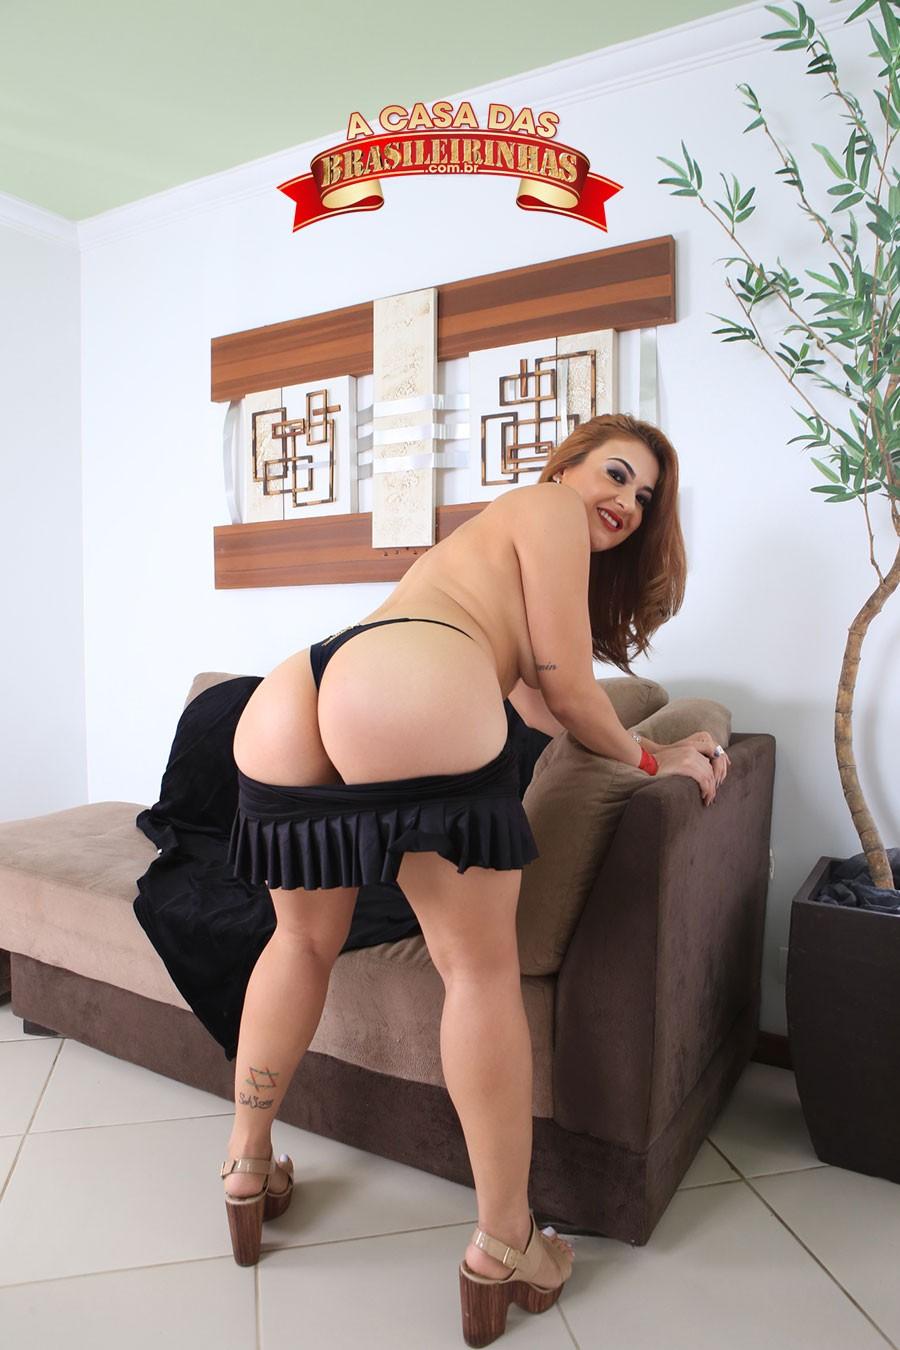 Tais-Daeva-de-costas-apoiando-no-sofa.jpg